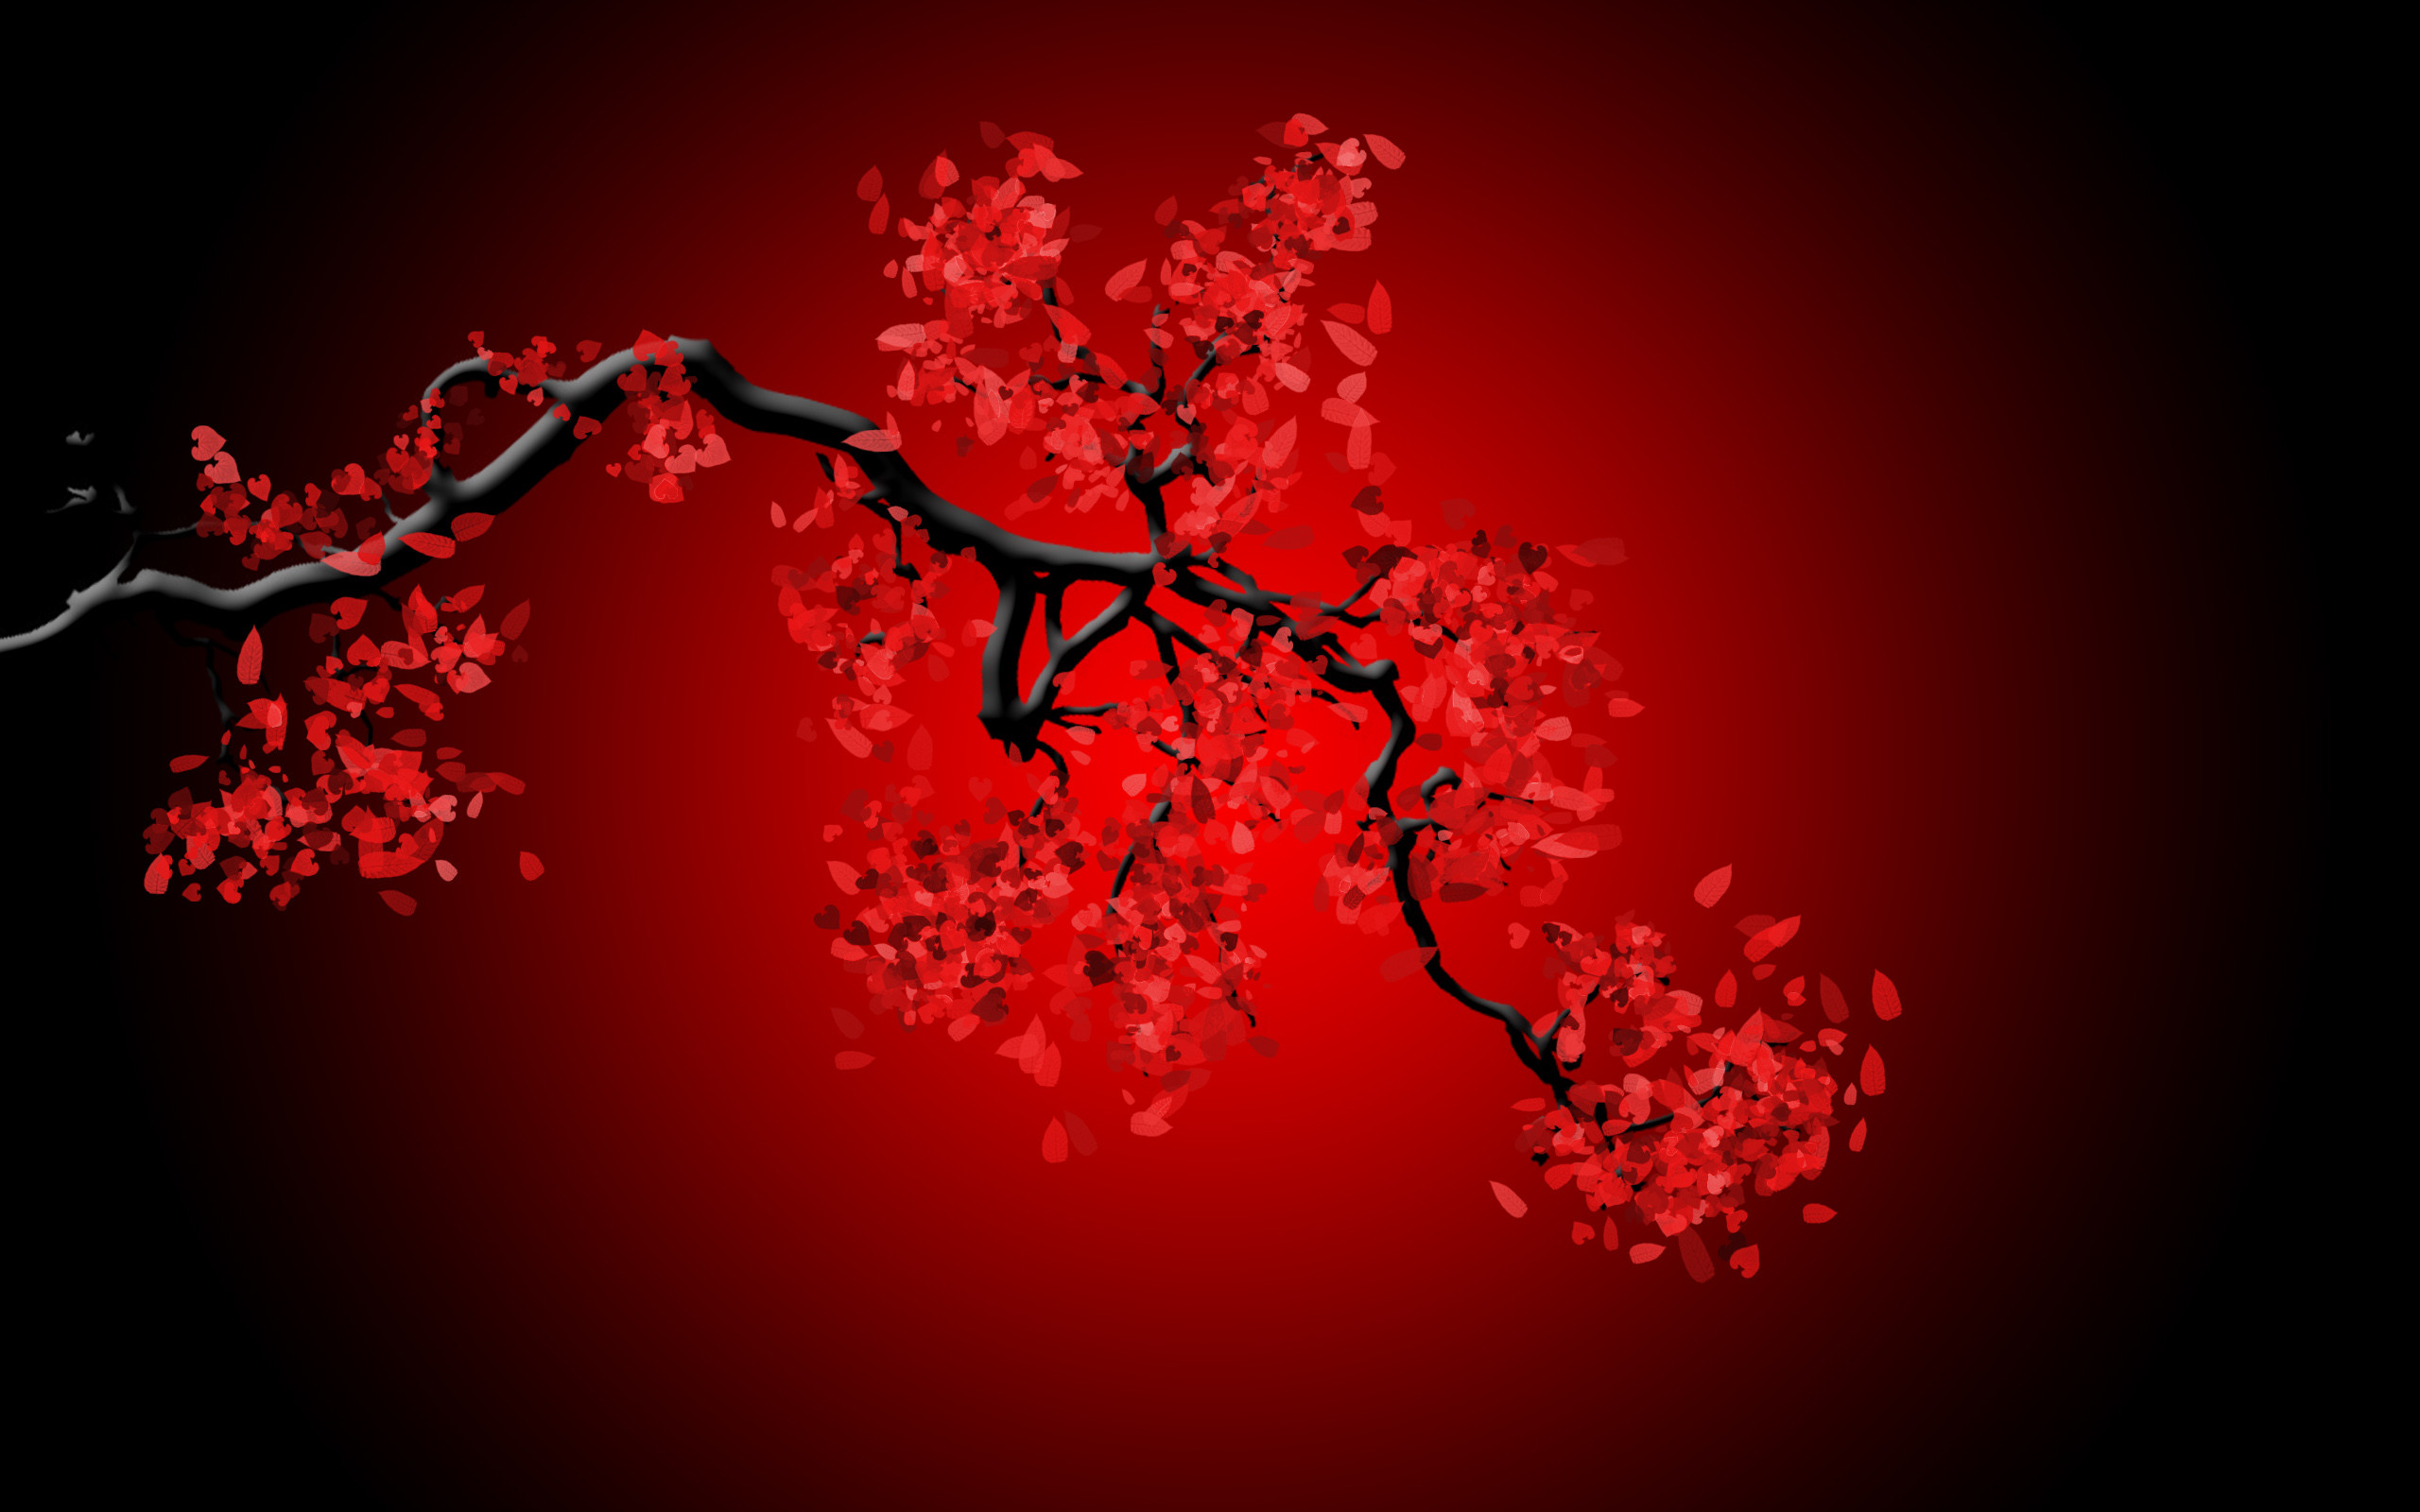 <b>RED</b> TREES NATURE LEAVES <b>DESKTOP BACKGROUND